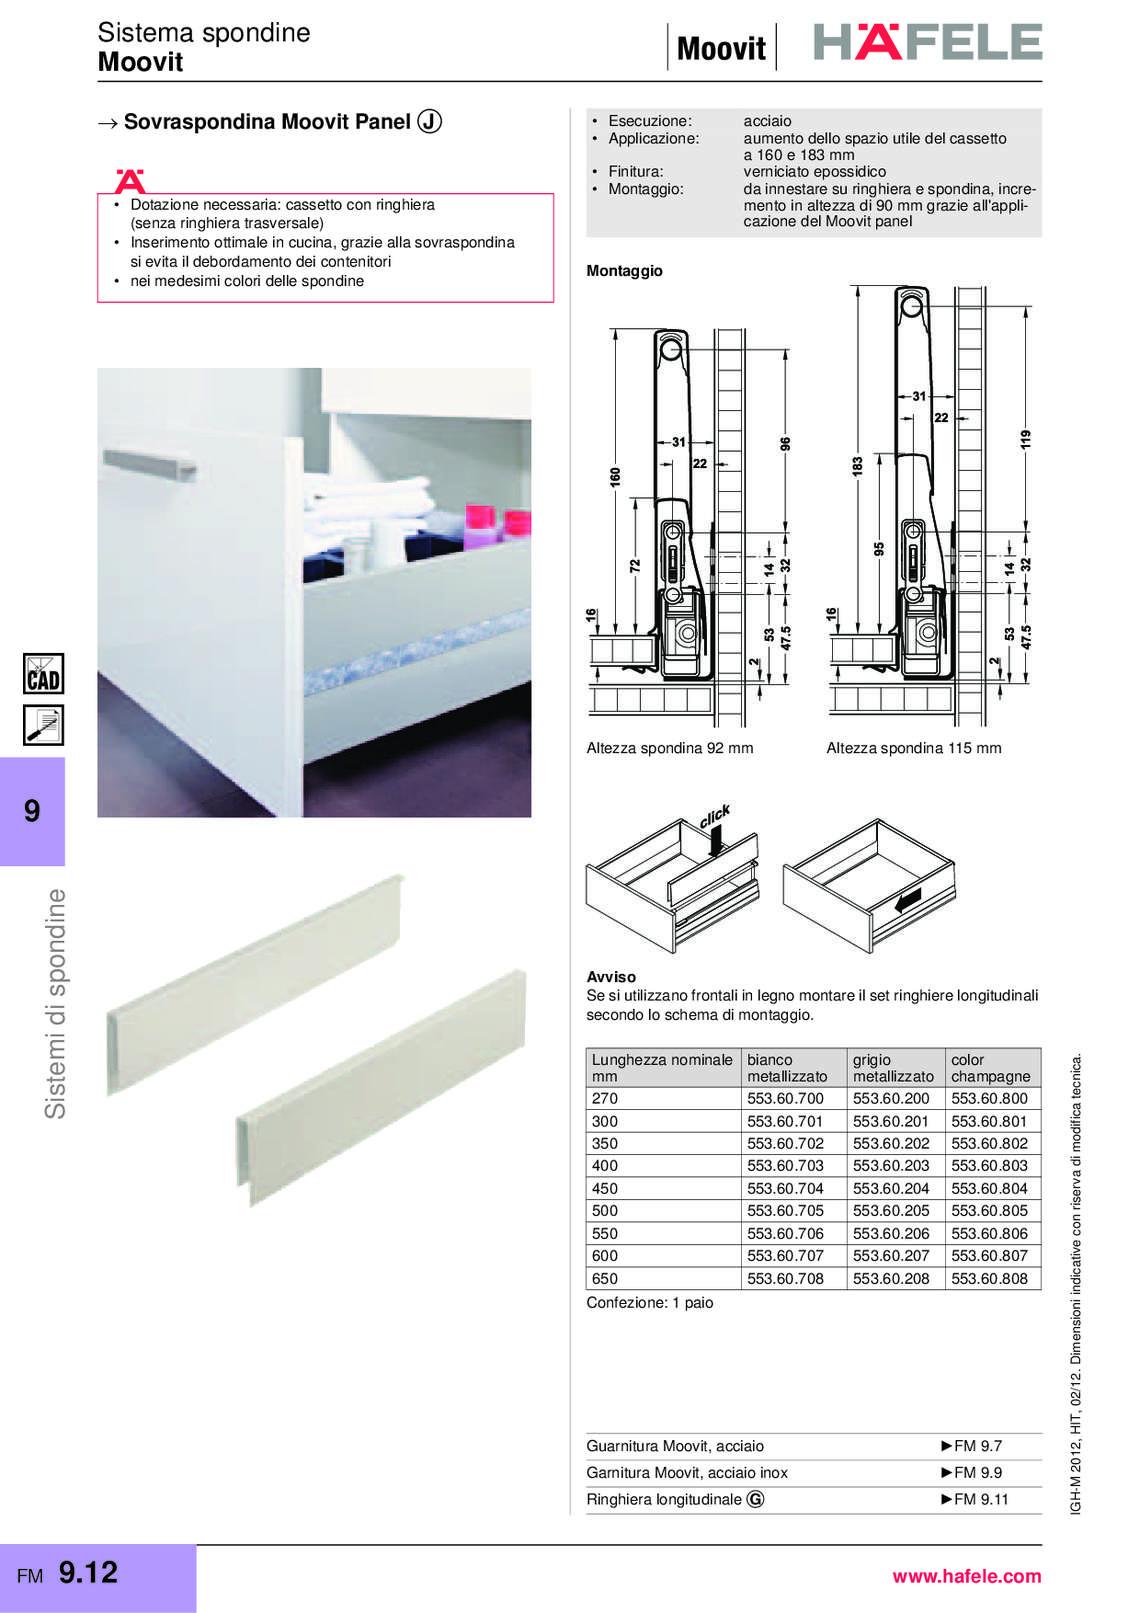 hafele-spondine-e-guide-per-mobili_40_025.jpg